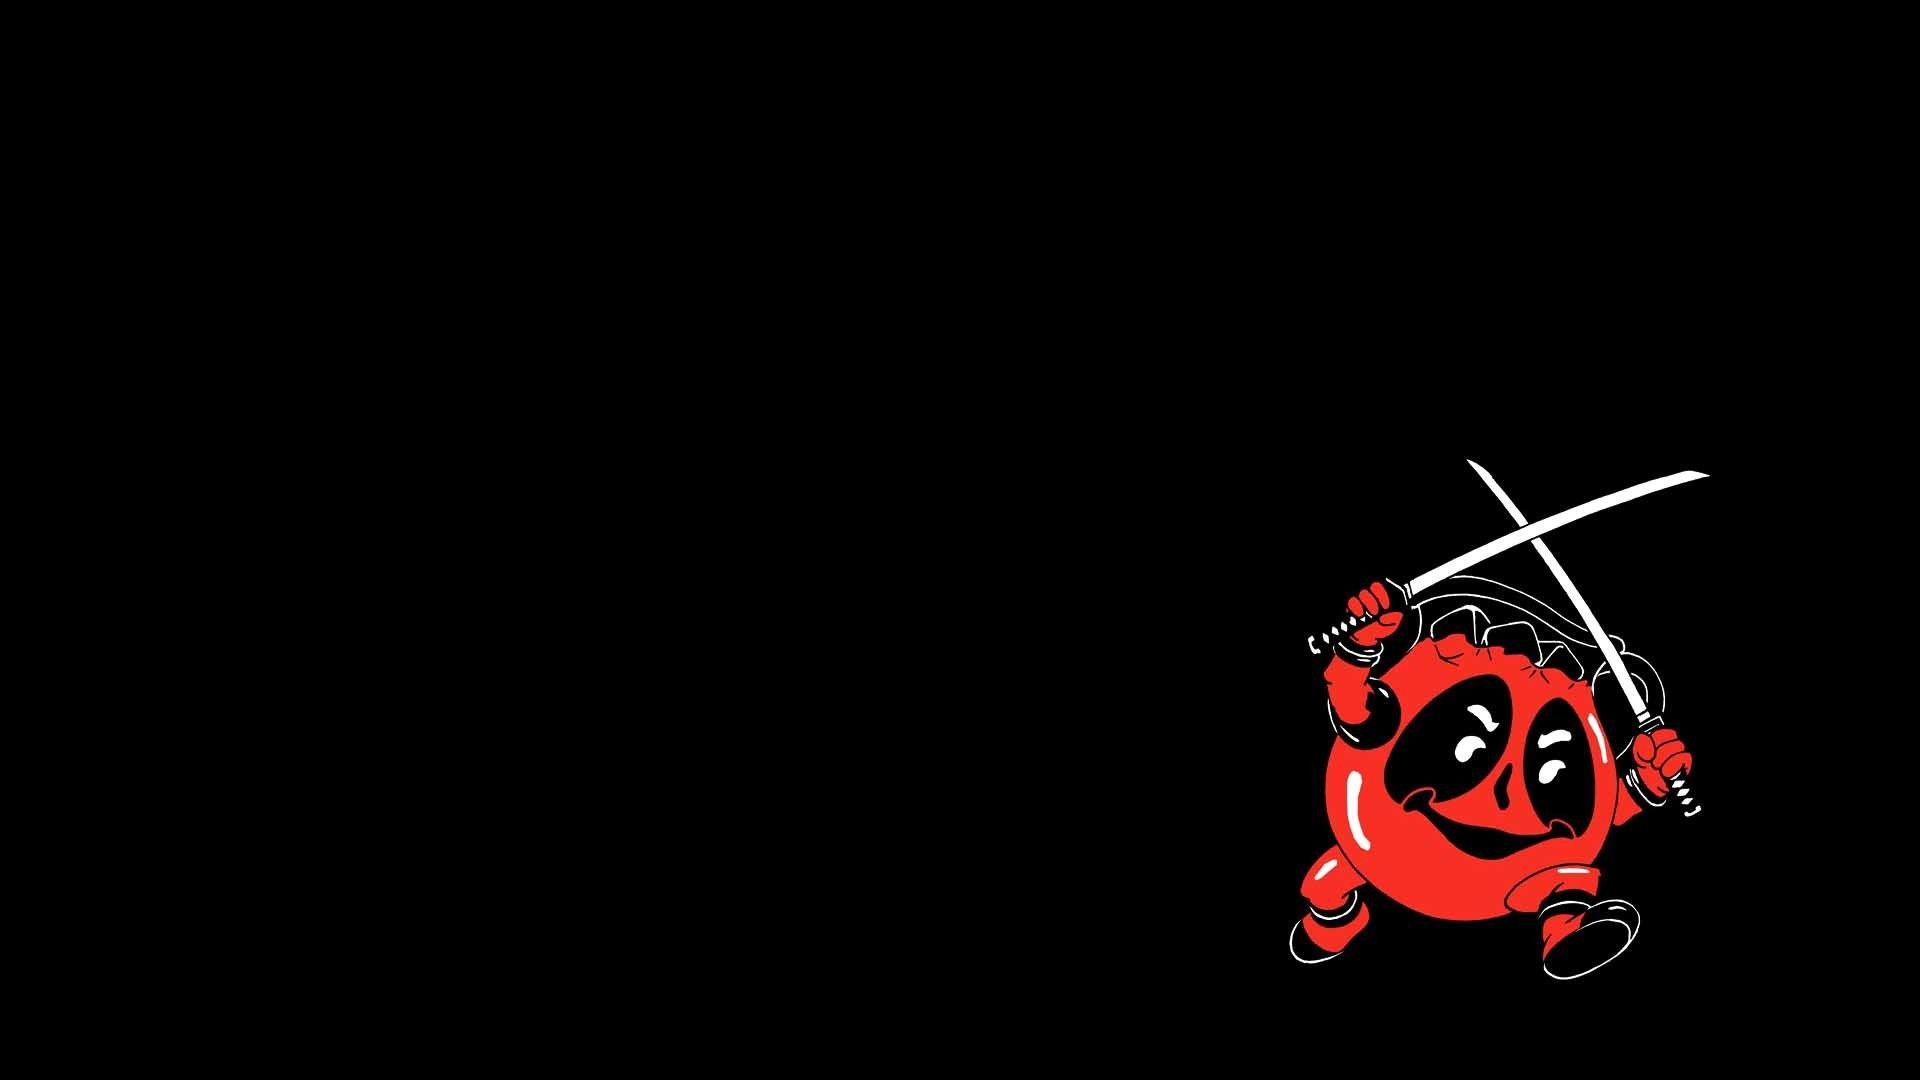 Awesome Deadpool Small Best Wallpaper For Desktop Hd In 2020 Really Cool Wallpapers Wallpaper Display Deadpool Wallpaper